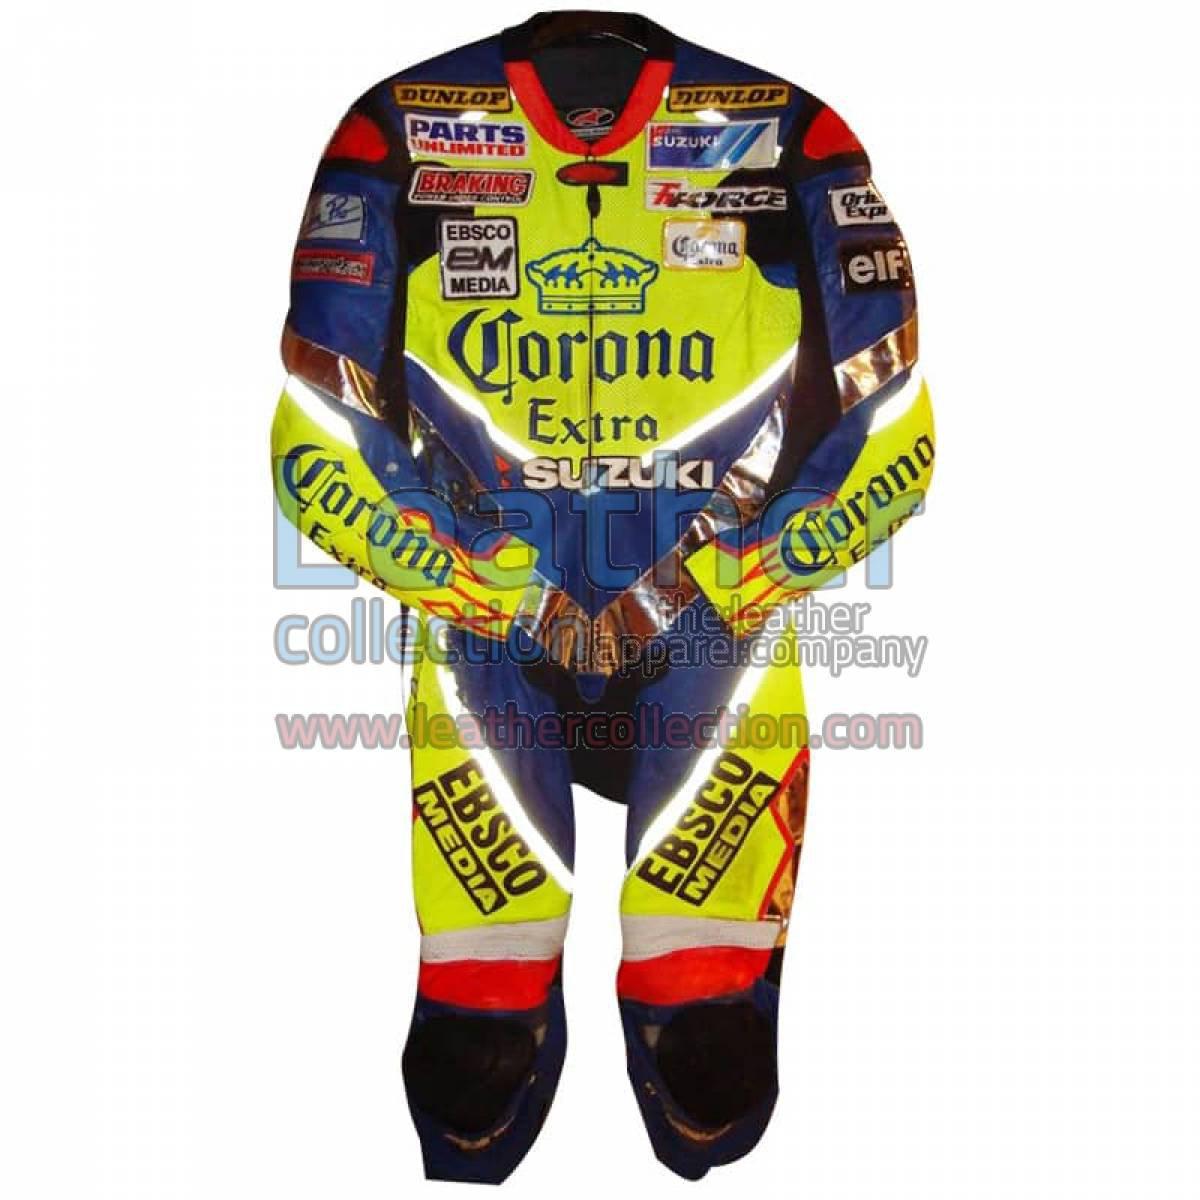 Anthony Gobert 2003 Corona Suzuki Leathers